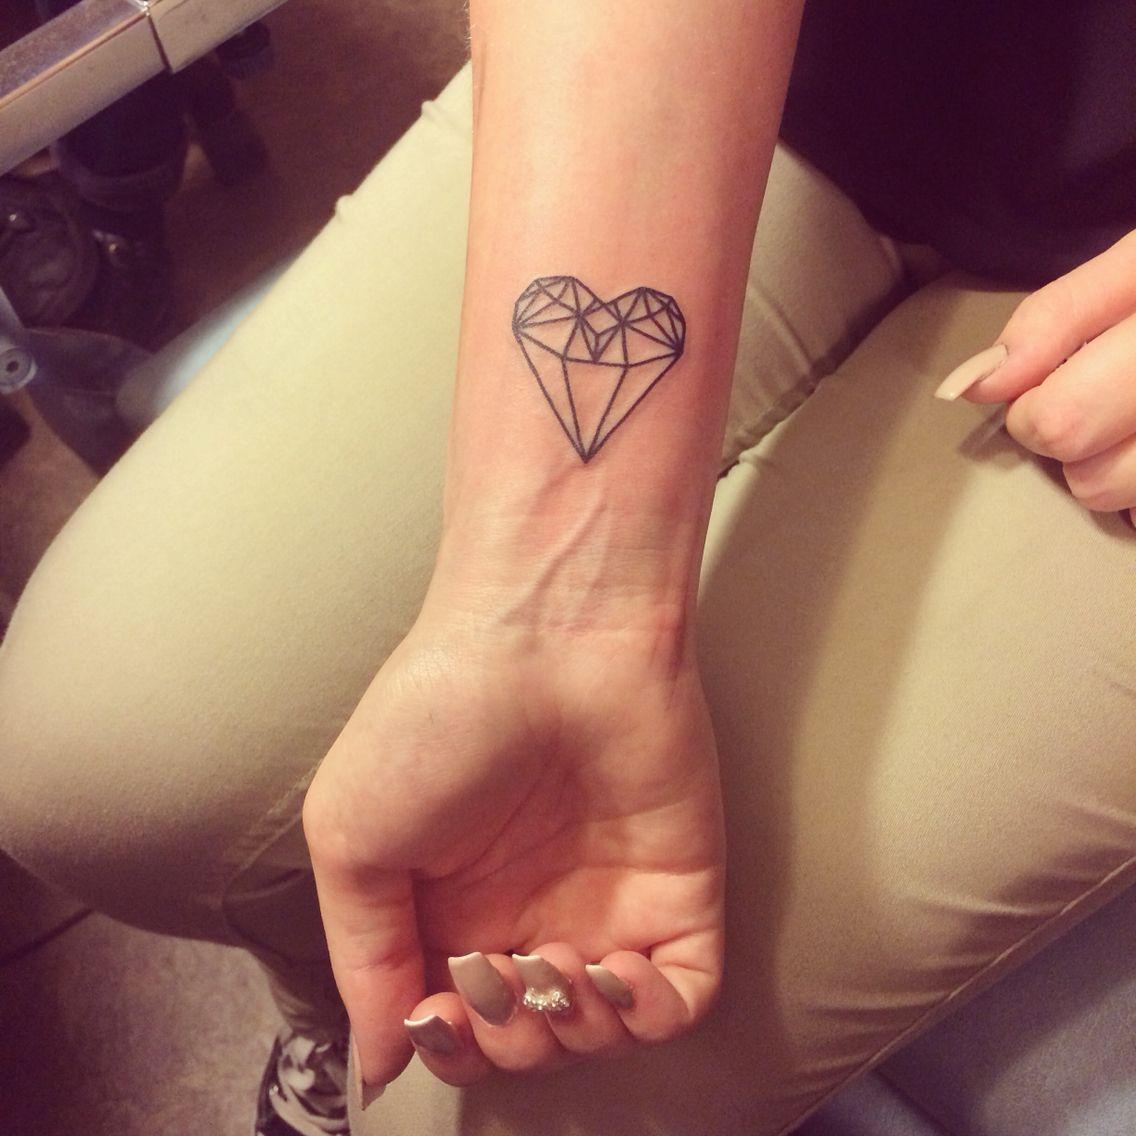 Simple geometric heart diamond tattoo #heart #tattoo #geometric #simple #girl #diamond